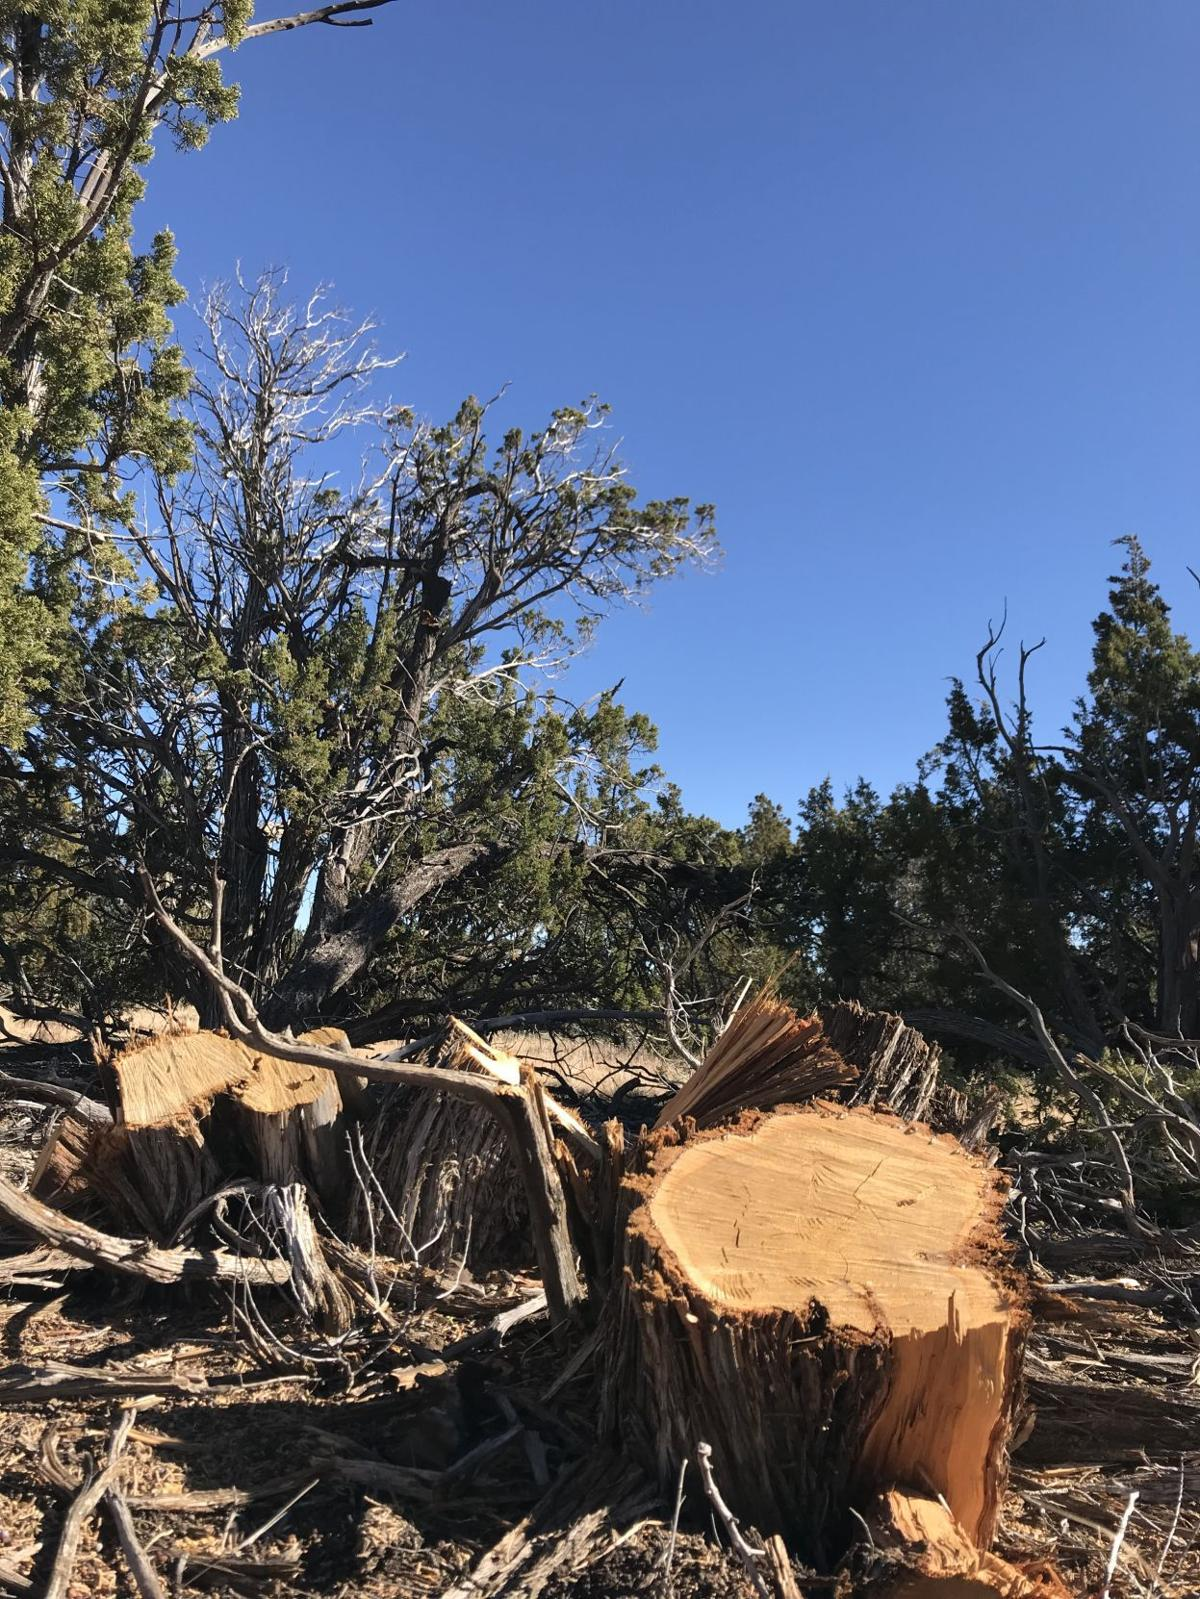 Cut juniper tree